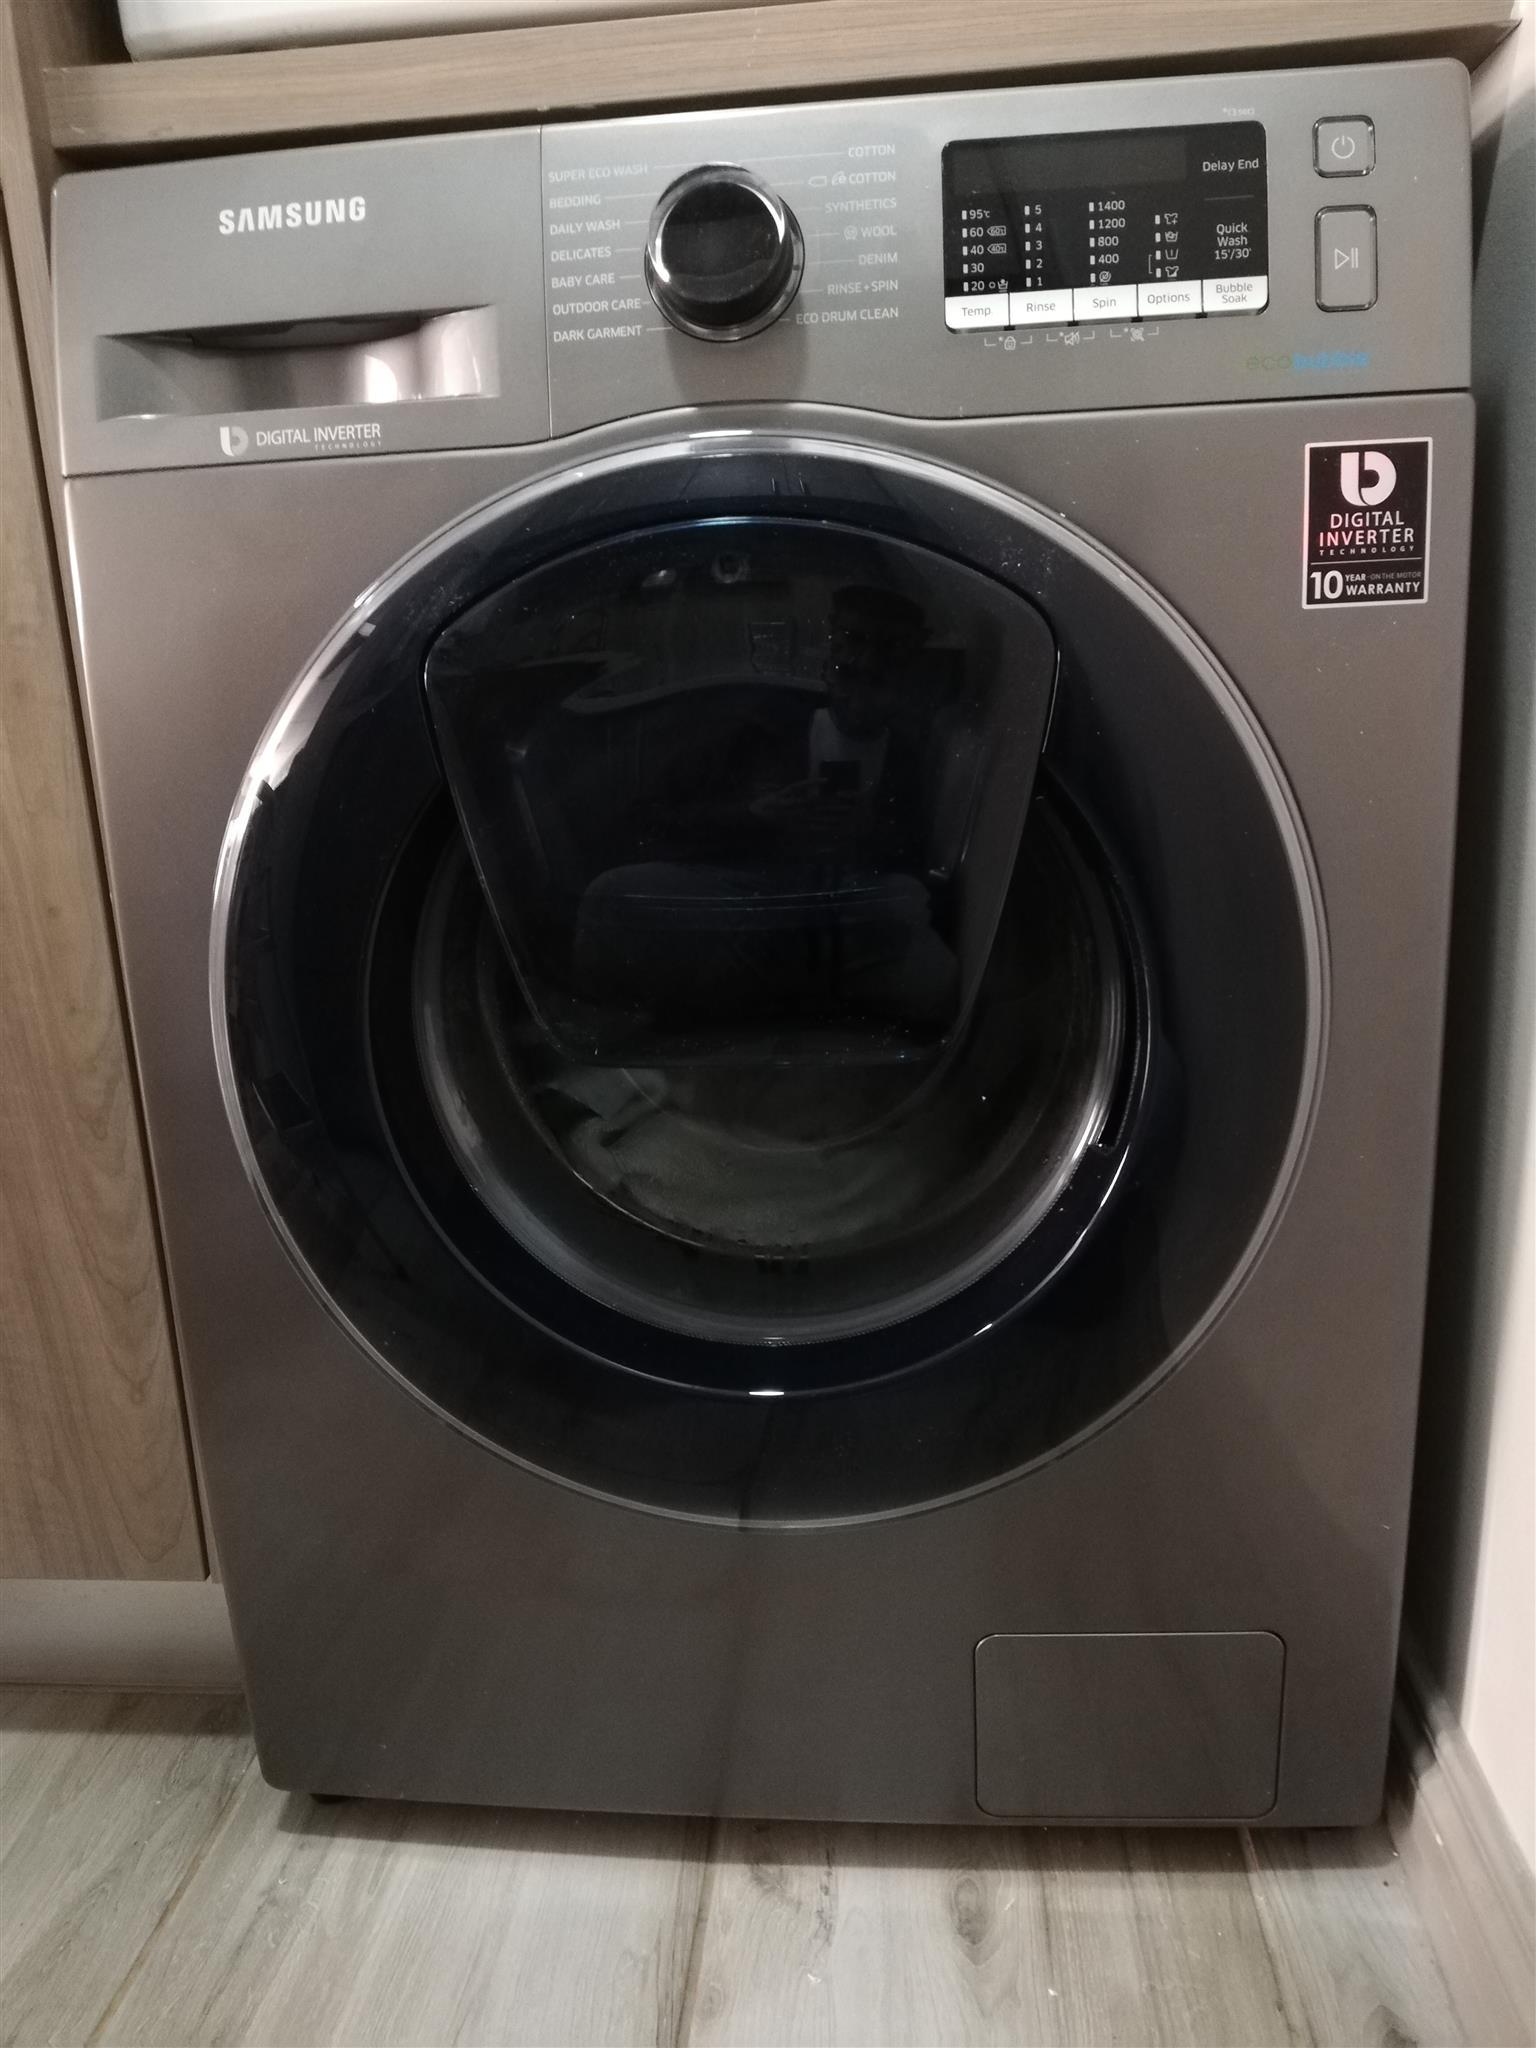 Samsung 9kg Add Wash Washing Machine Digital Inverter Bubble Soak